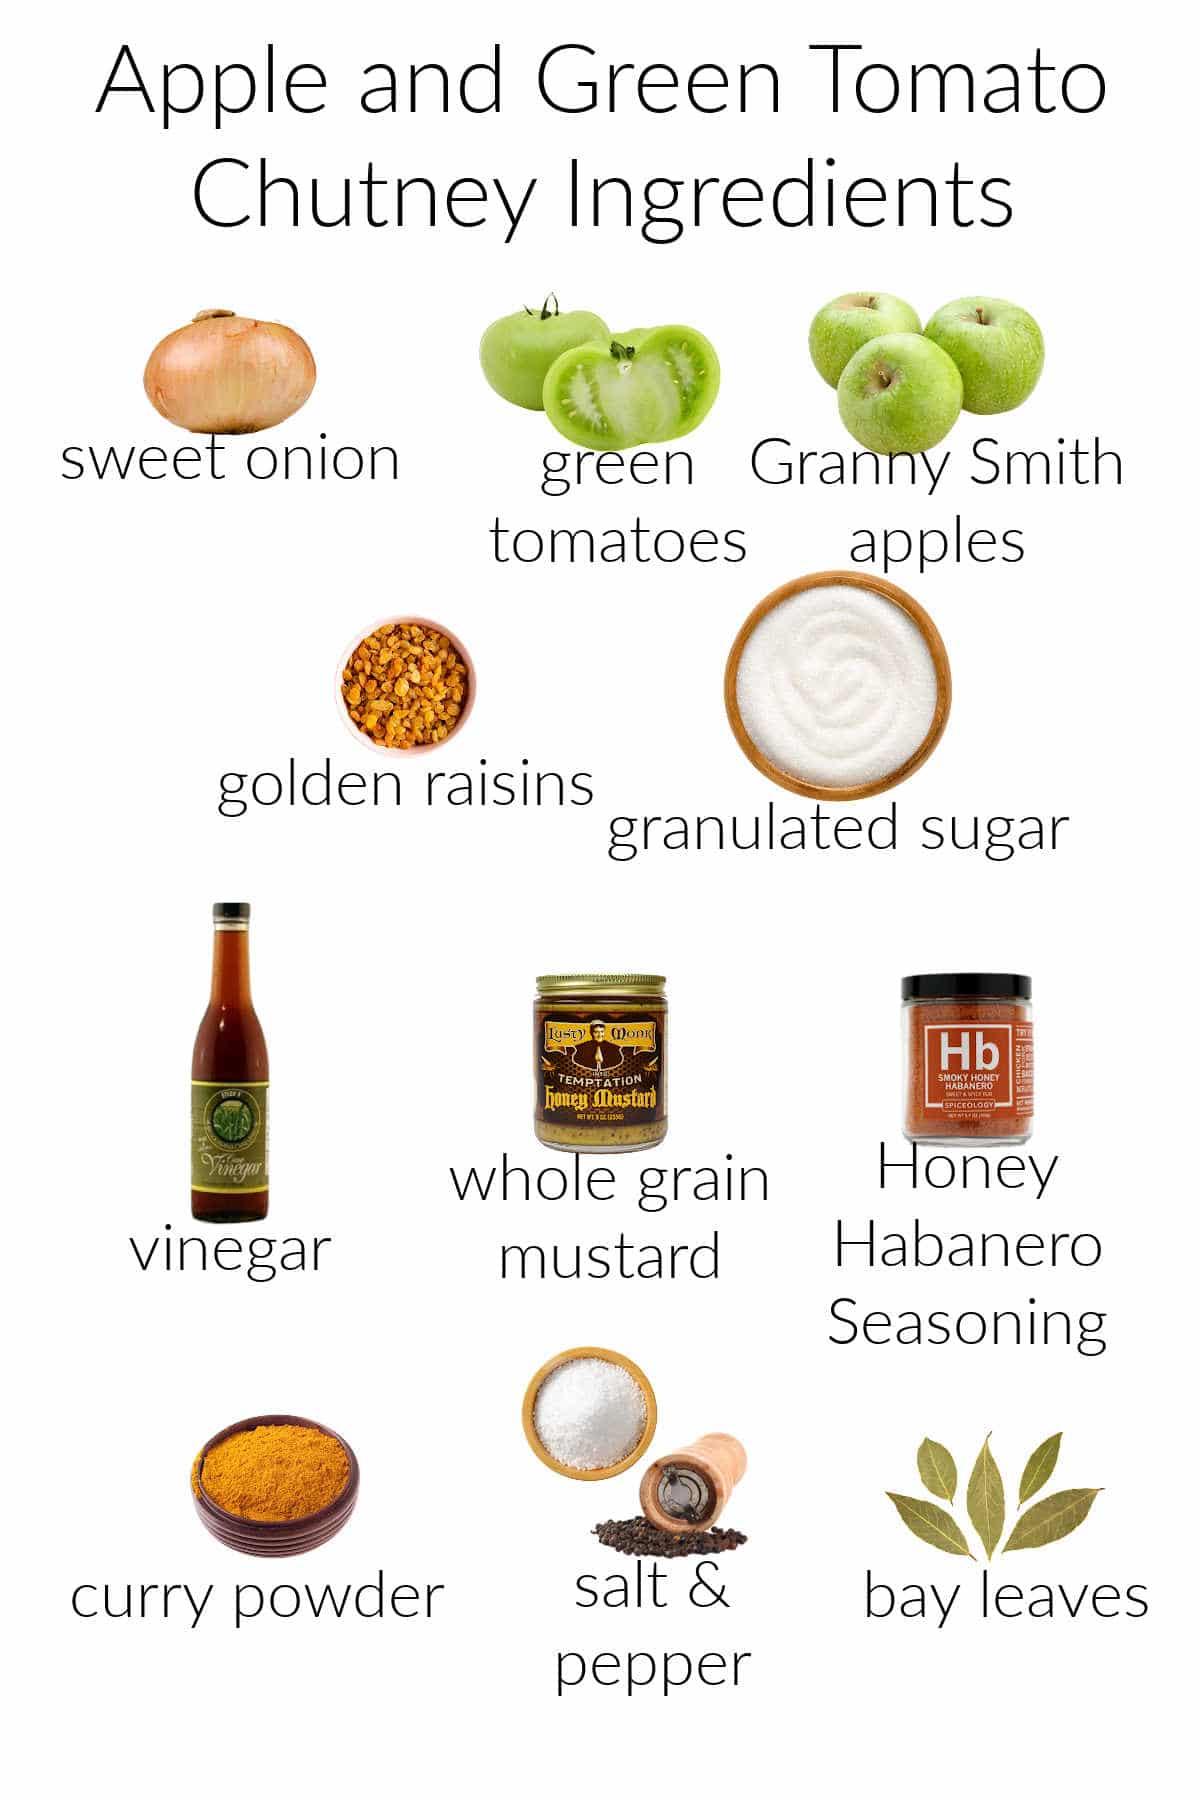 Collage of ingredients for making apple green tomato chutney: onions, green tomatoes, green apples, golden raisins, sugar, vinegar, mustard, honey habanero seasoning, curry powder, salt & pepper, and bay leaf.